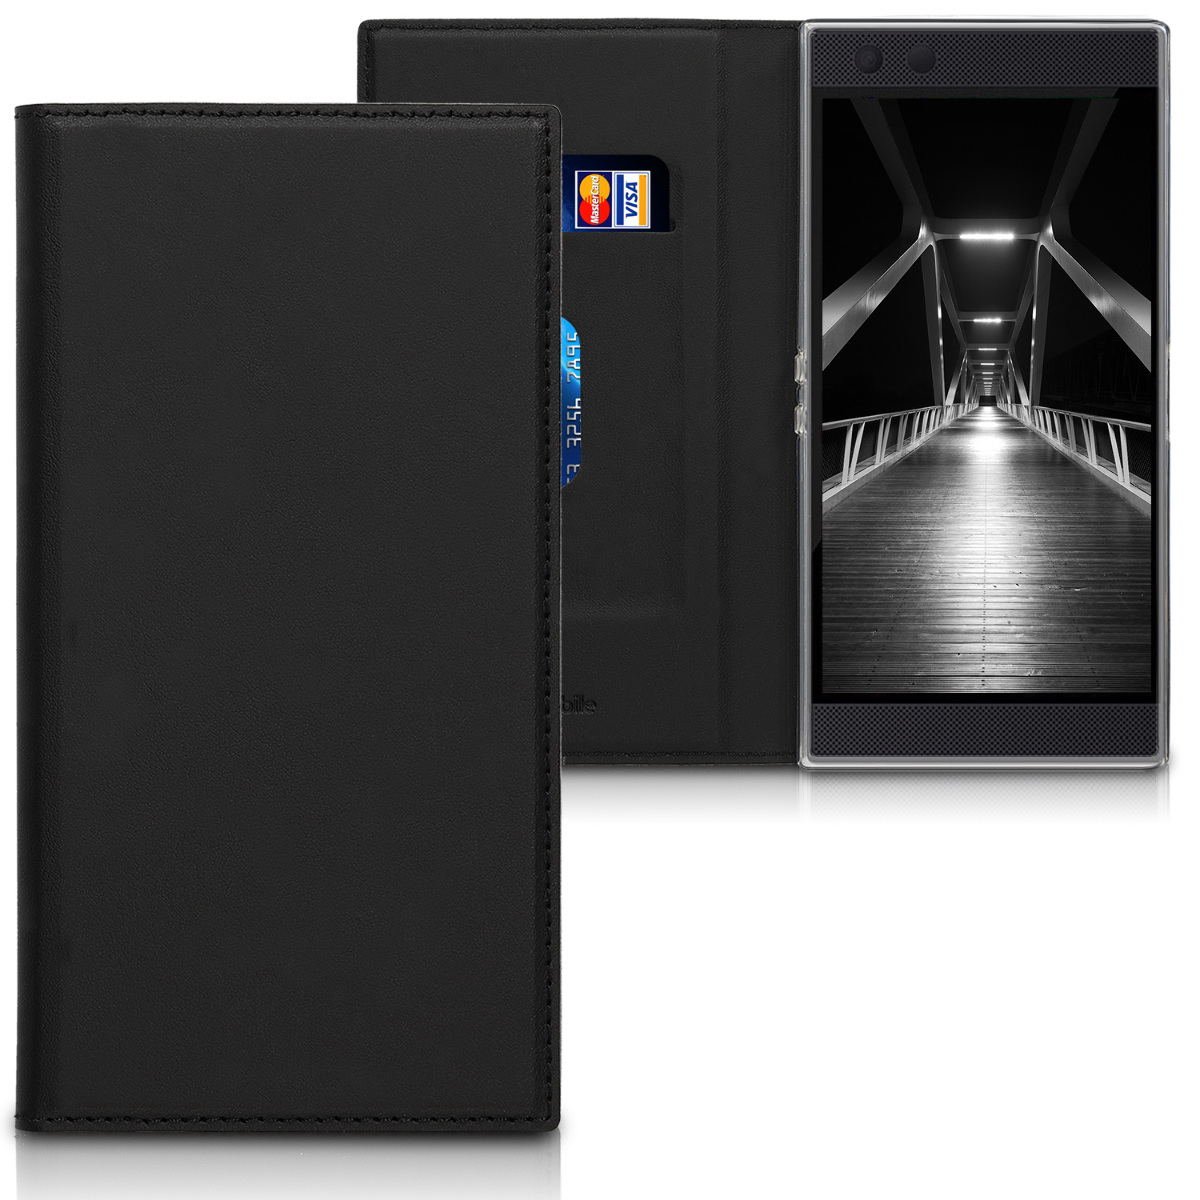 KW Θήκη Flip Razer Phone 2 - Μαύρο (46789.01)